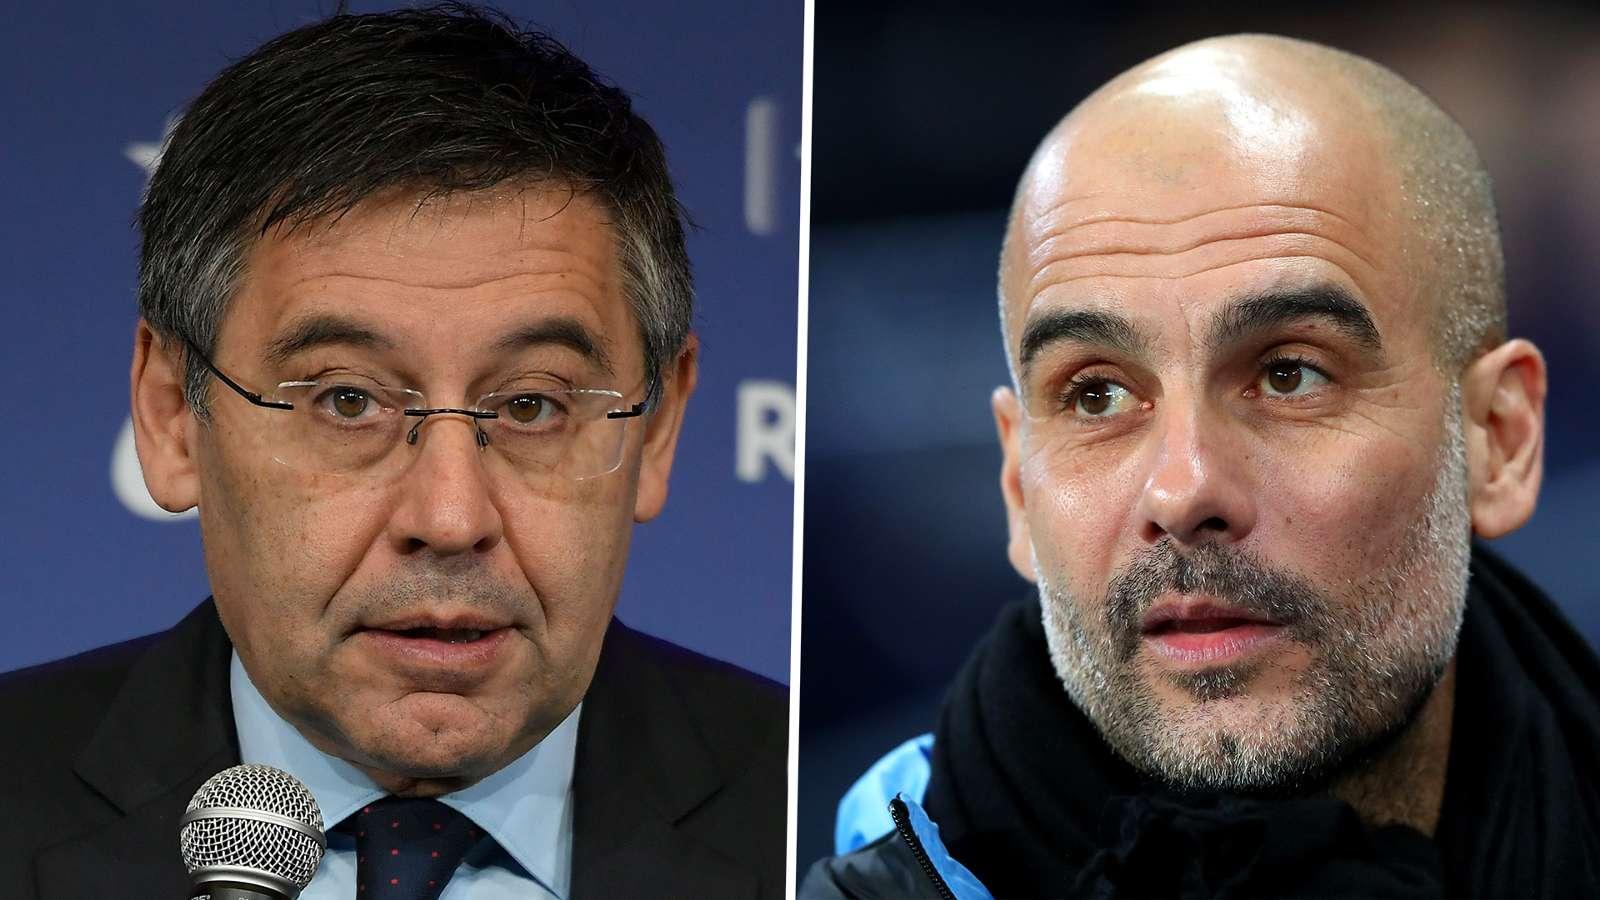 'Don't talk too loud, Barcelona!' - Guardiola bites back after Bartomeu's FFP comments - Bóng Đá